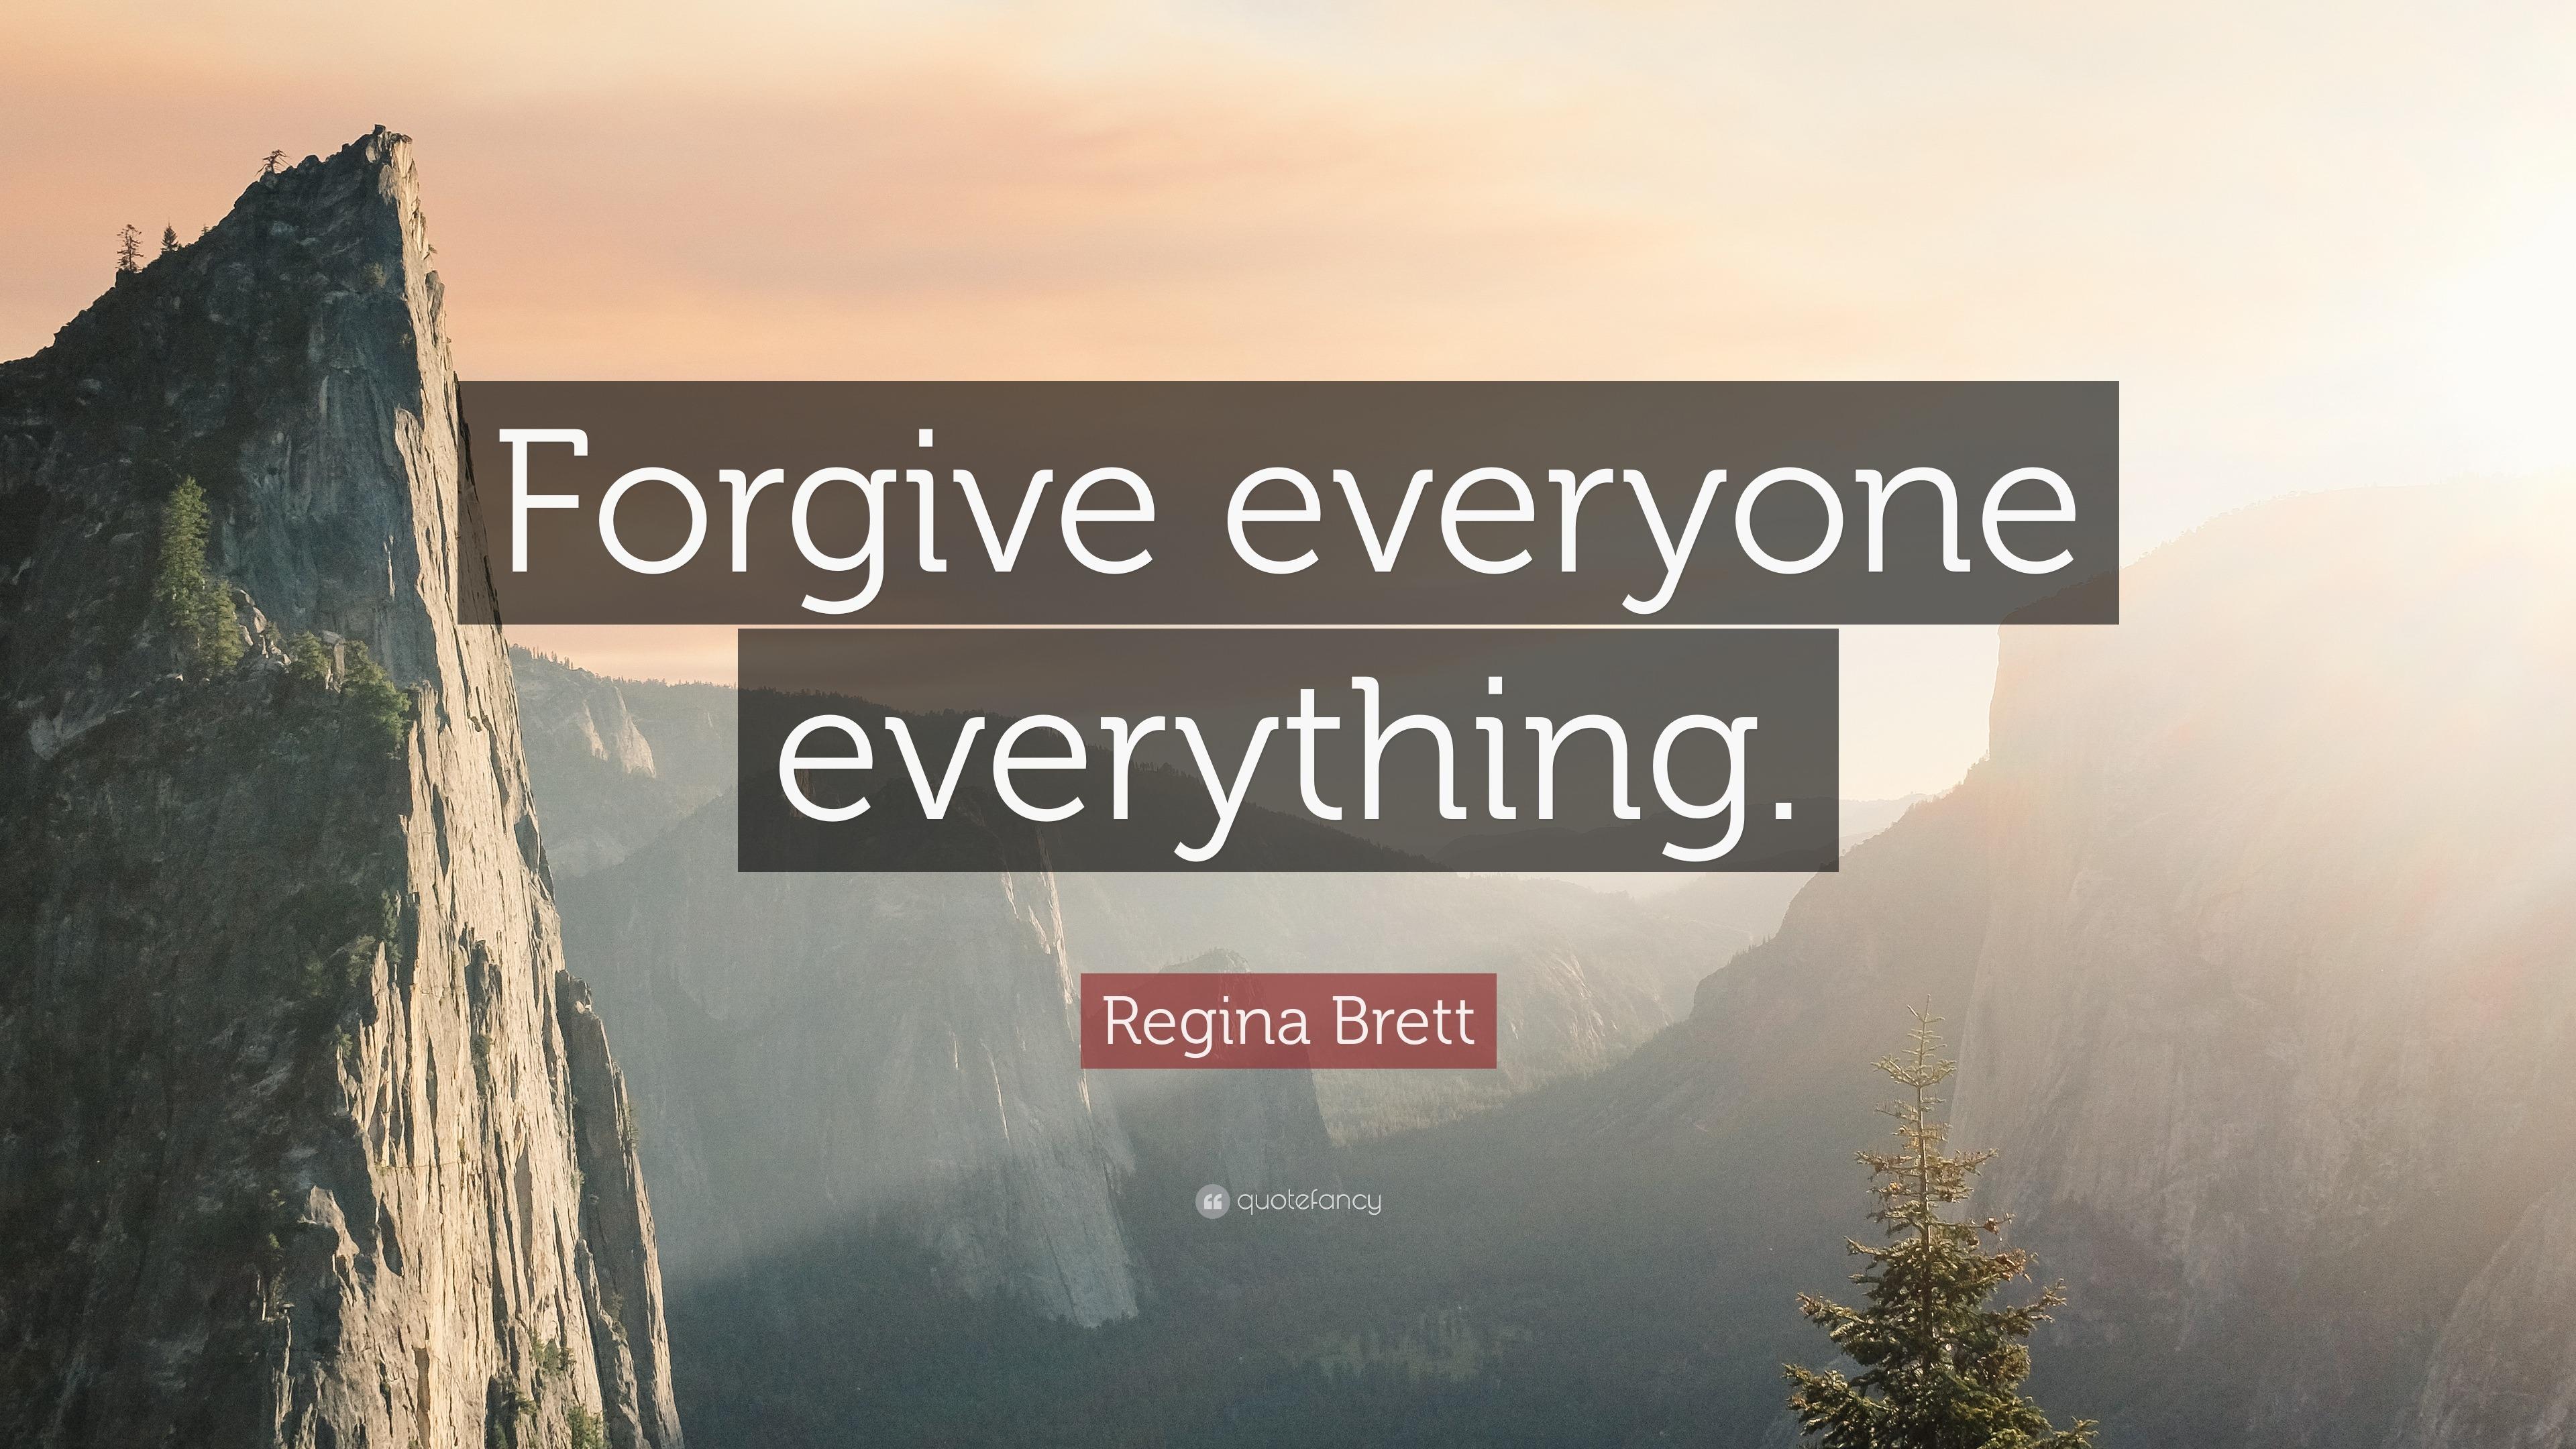 How to forgive everyone 58